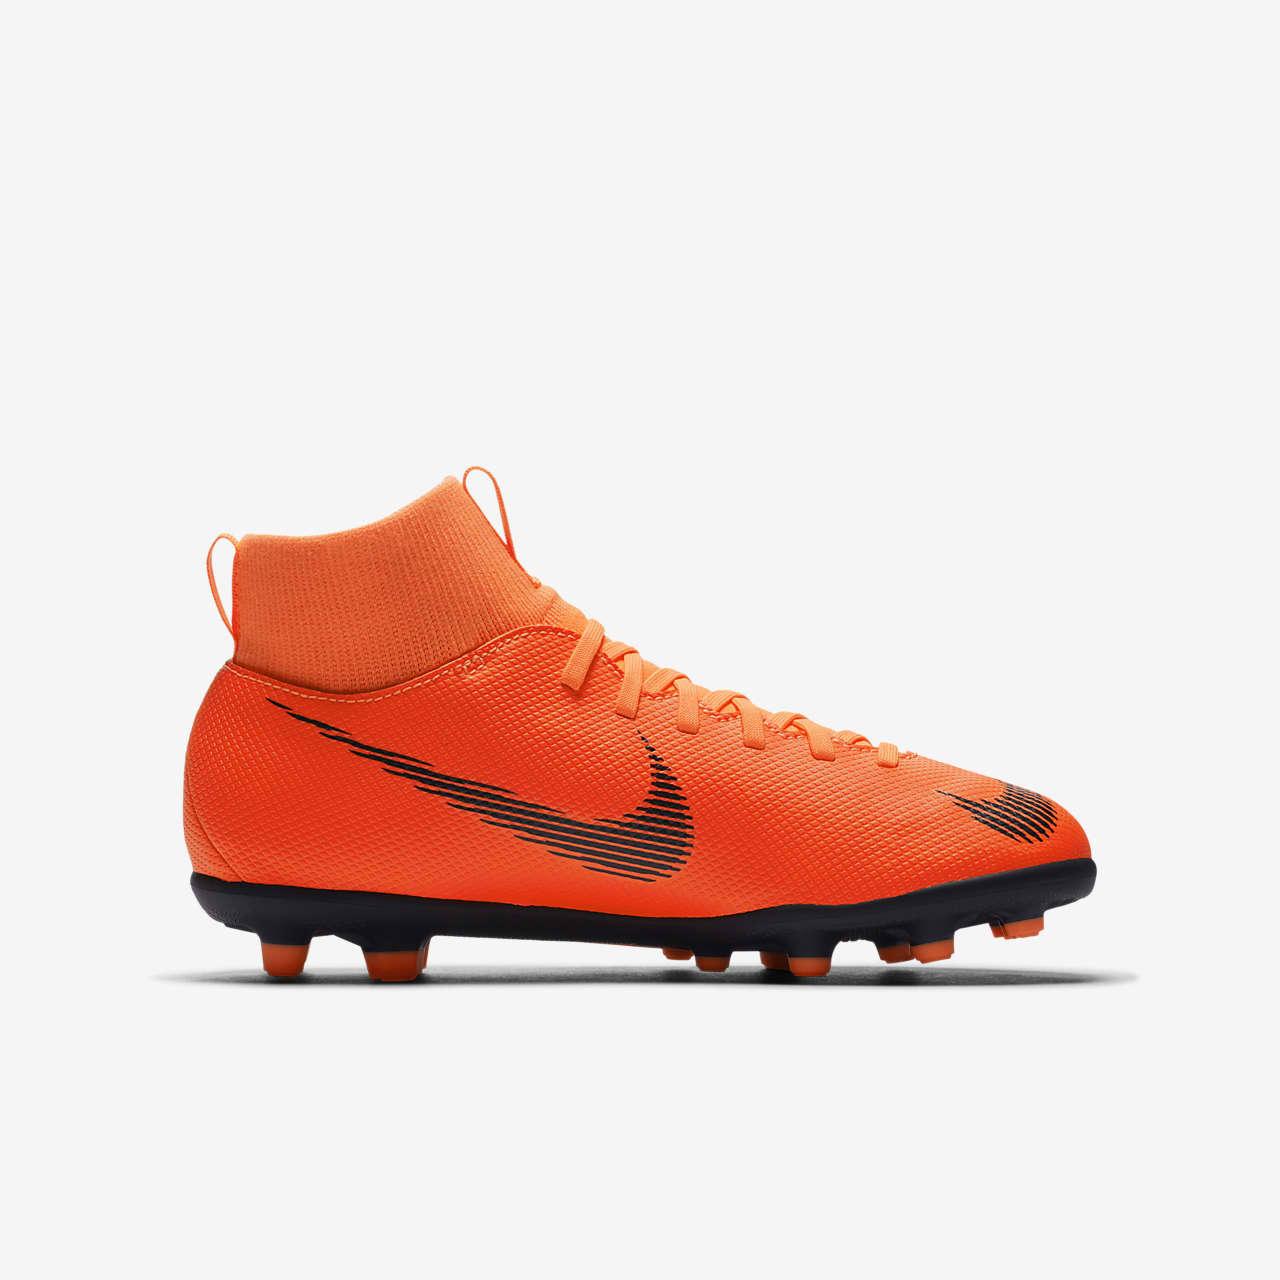 ciclo Retencion Propuesta  Nike Jr. Mercurial Superfly 6 Club MG Younger/Older Kids' Multi-Ground  Football Boot. Nike ID